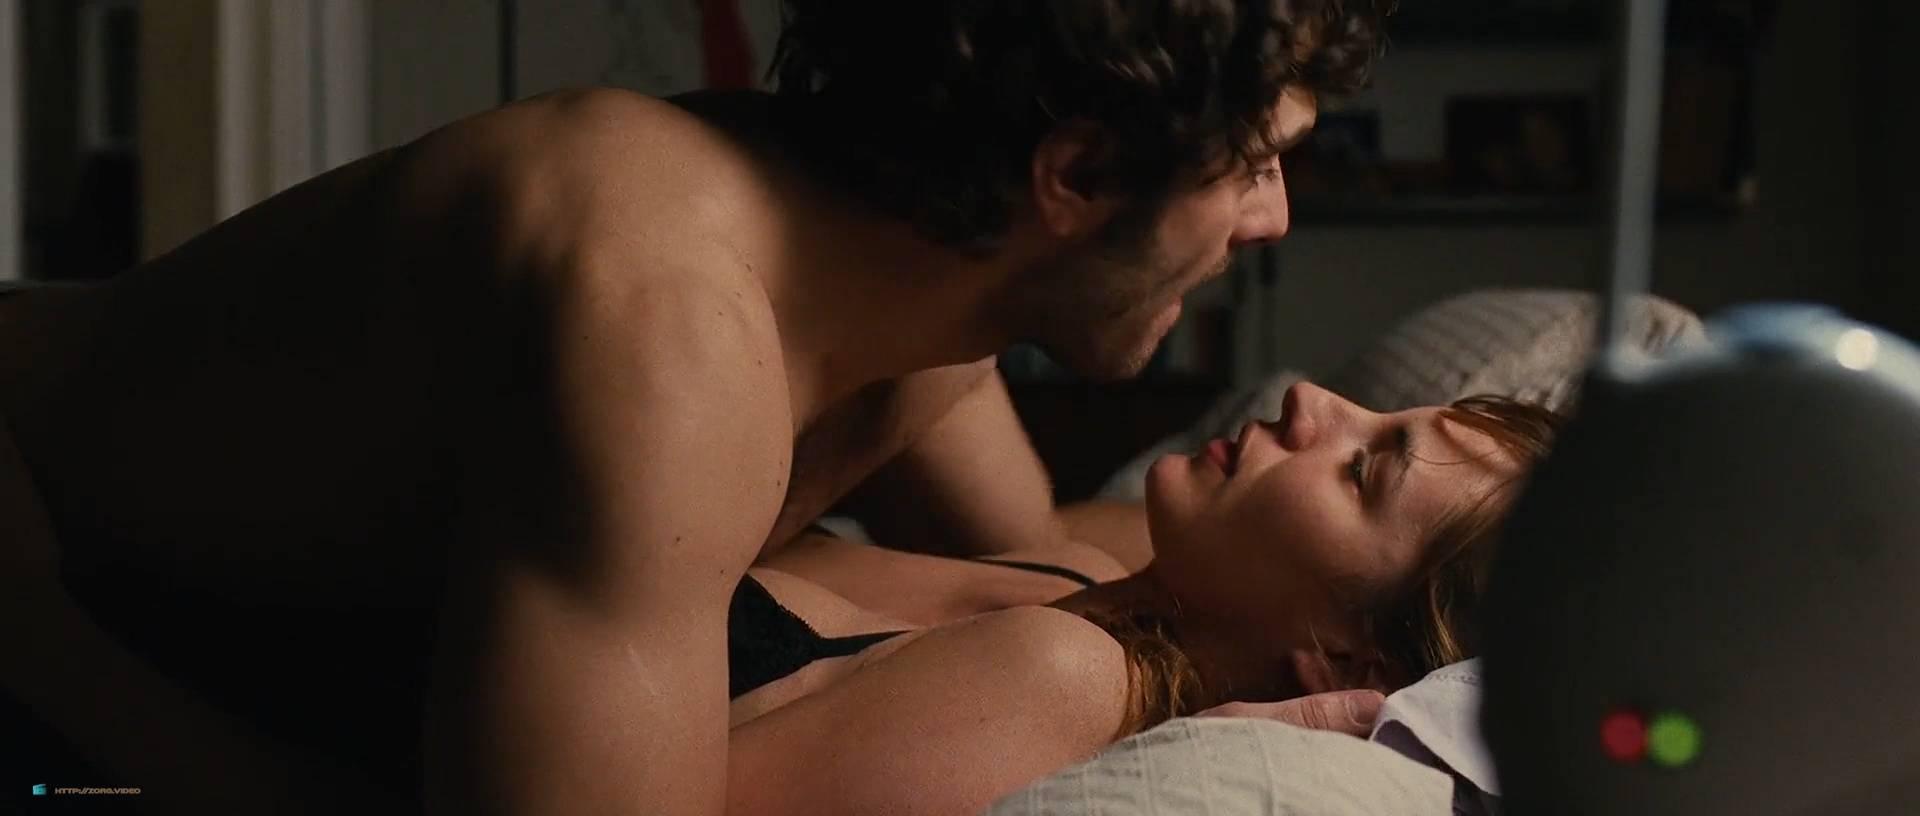 Louise Bourgoin nude and pregnant in - Unheureux événement (FR-2011) HD 1080p (6)